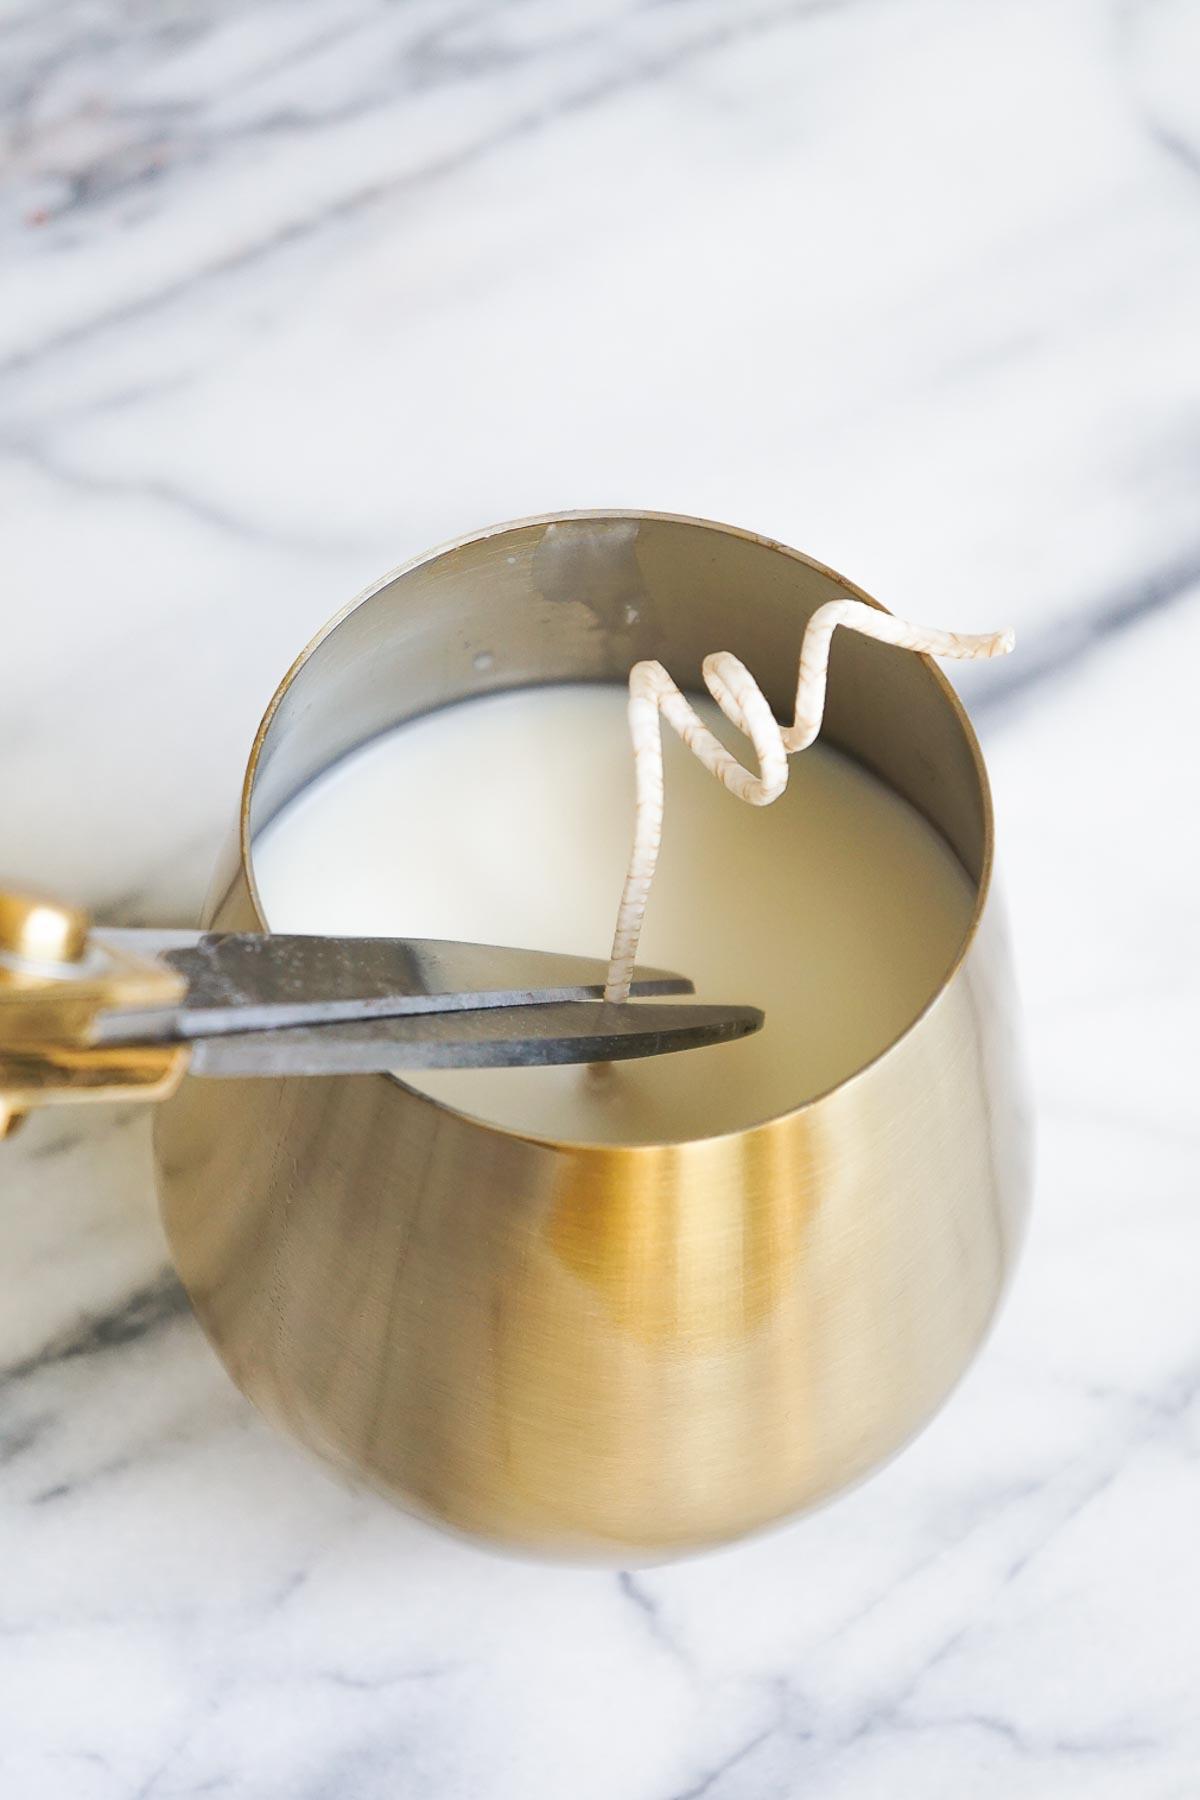 DIY Rosemary and Grapefruit Candle how to by Sugar & Cloth, an award winning DIY blog.